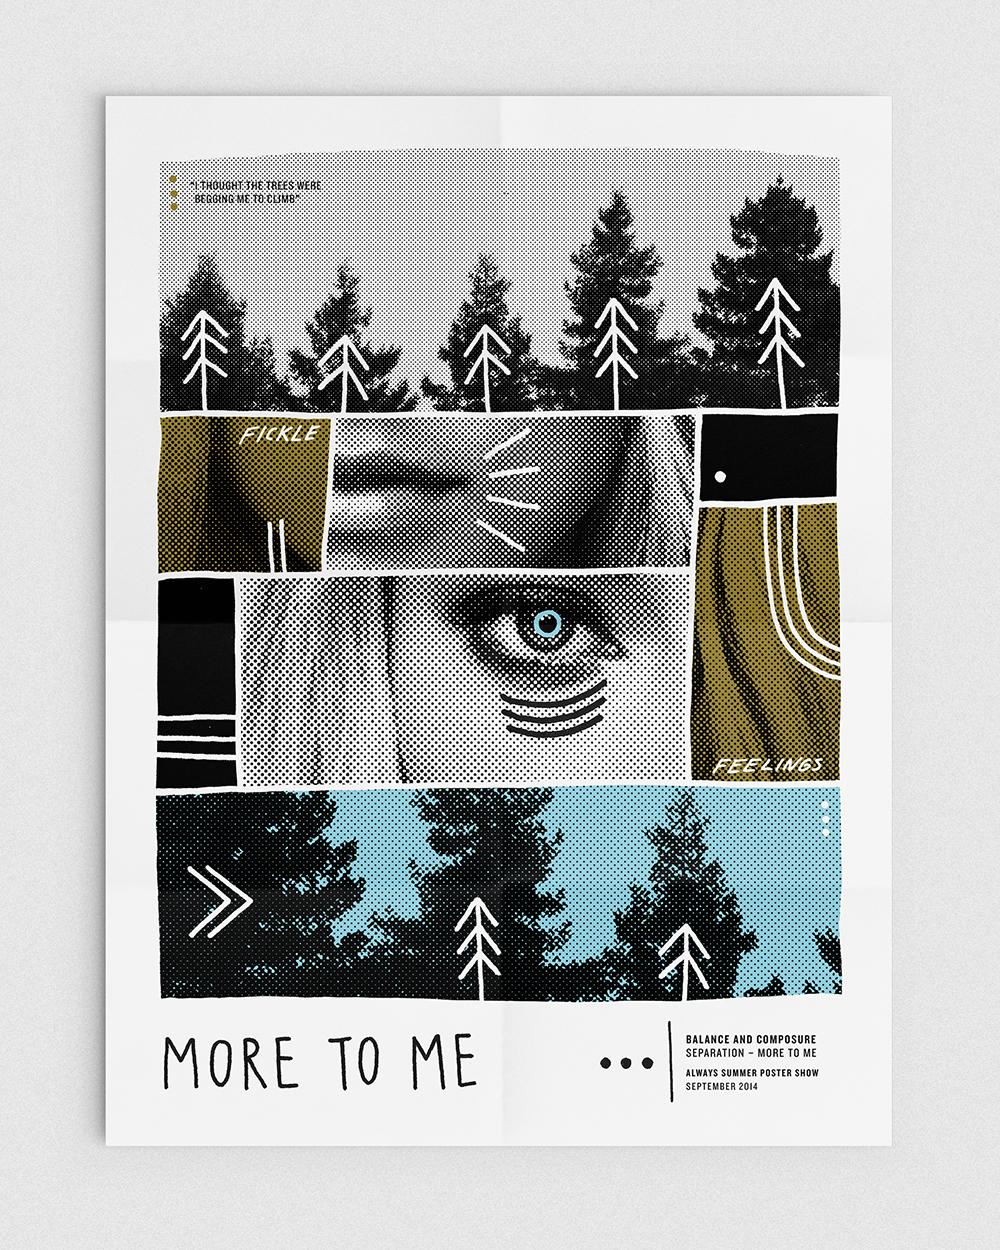 MoreToMe_Poster_Mockup.jpg